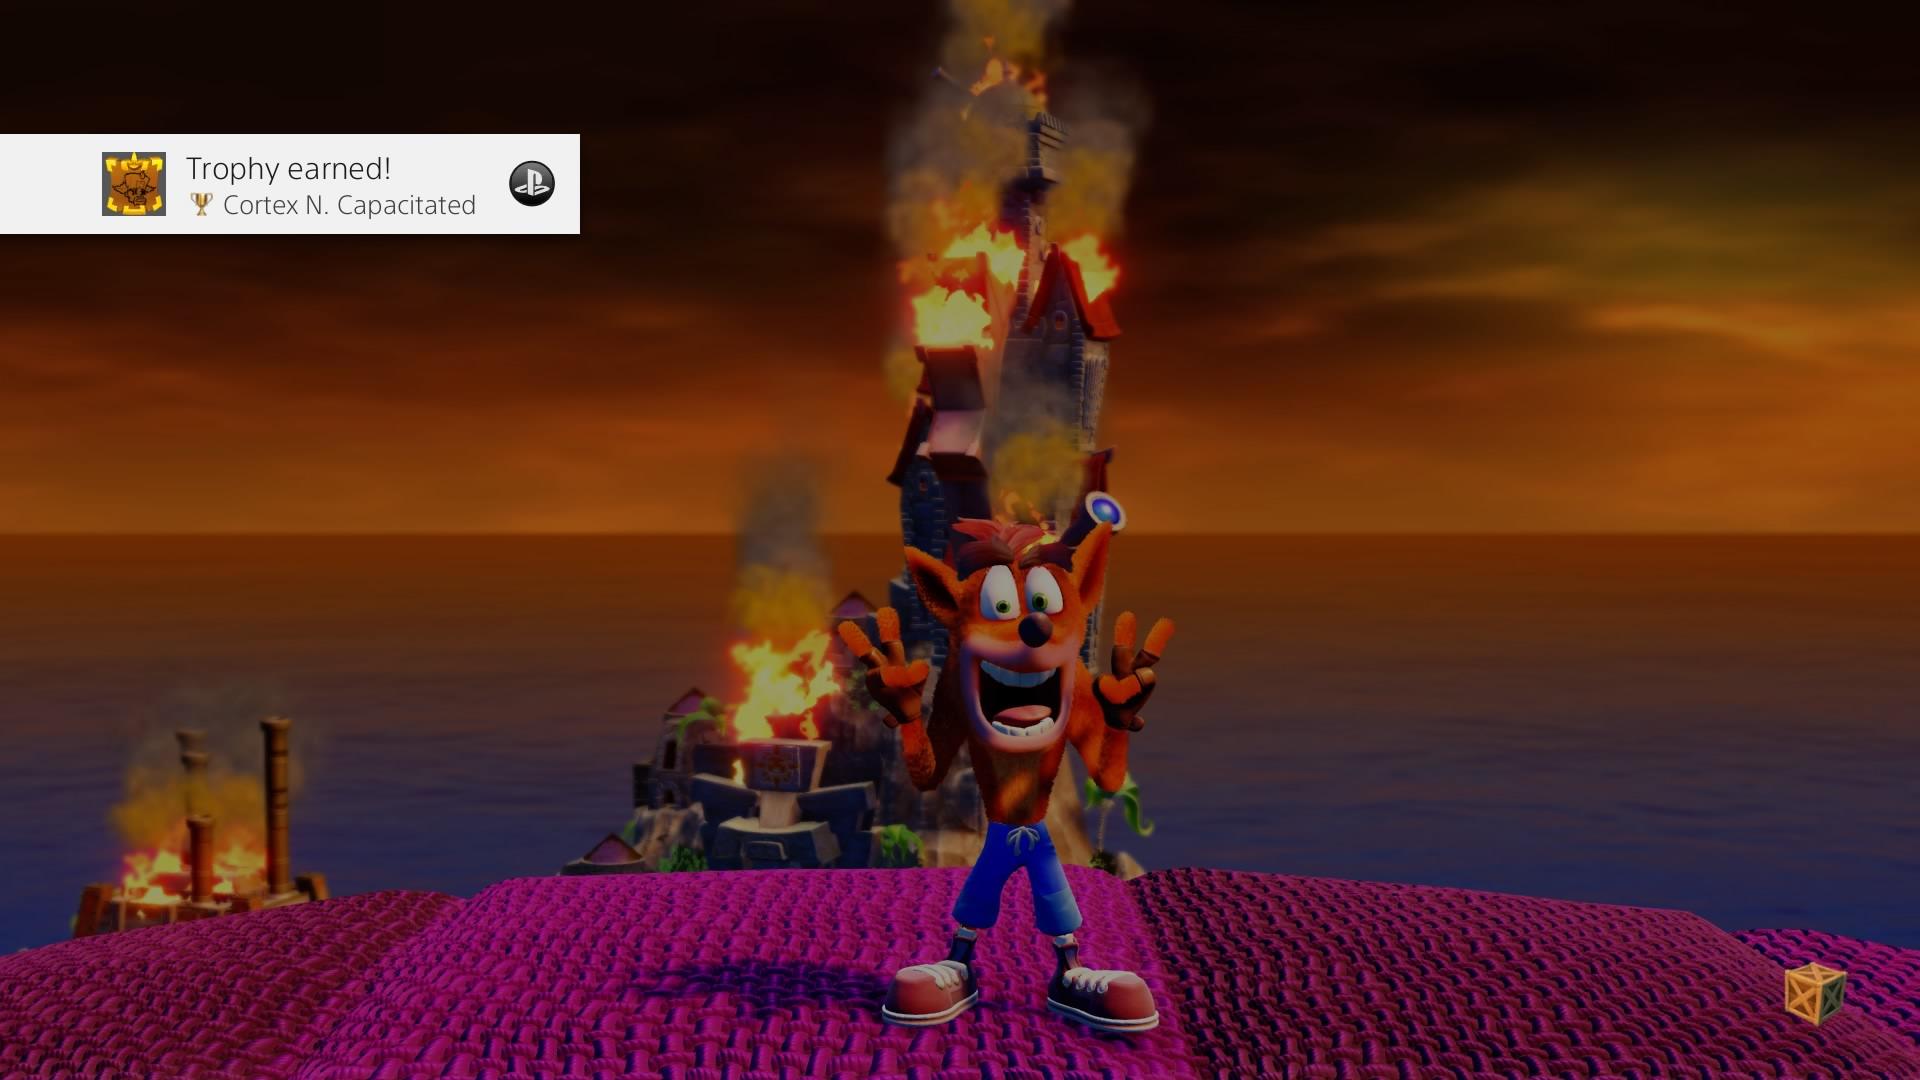 Crash Bandicoot N. Sane Trilogy - Jefe final derrotado